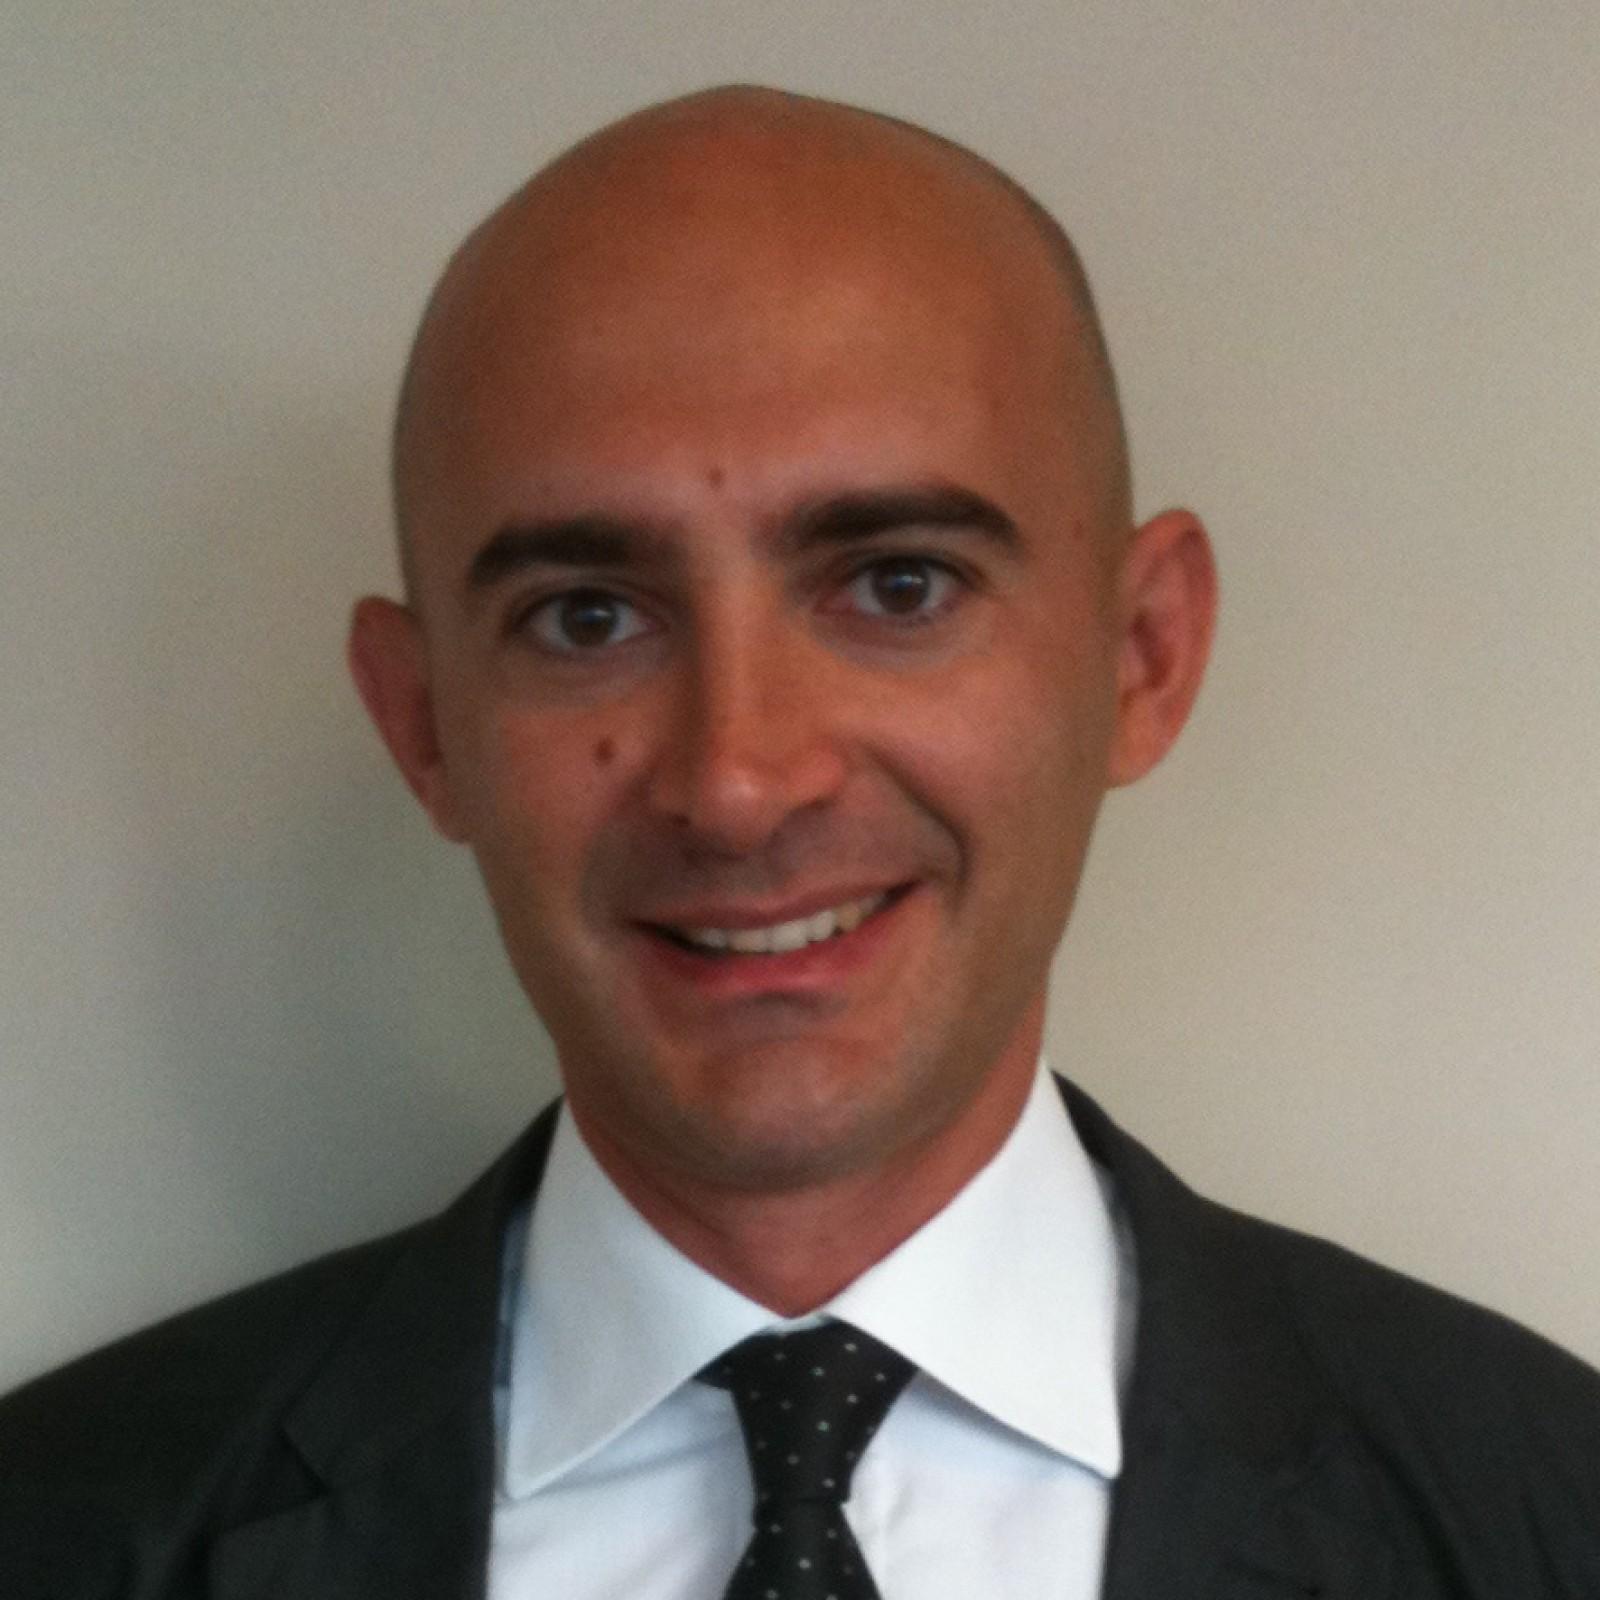 Dr Vincenzo Scorcia